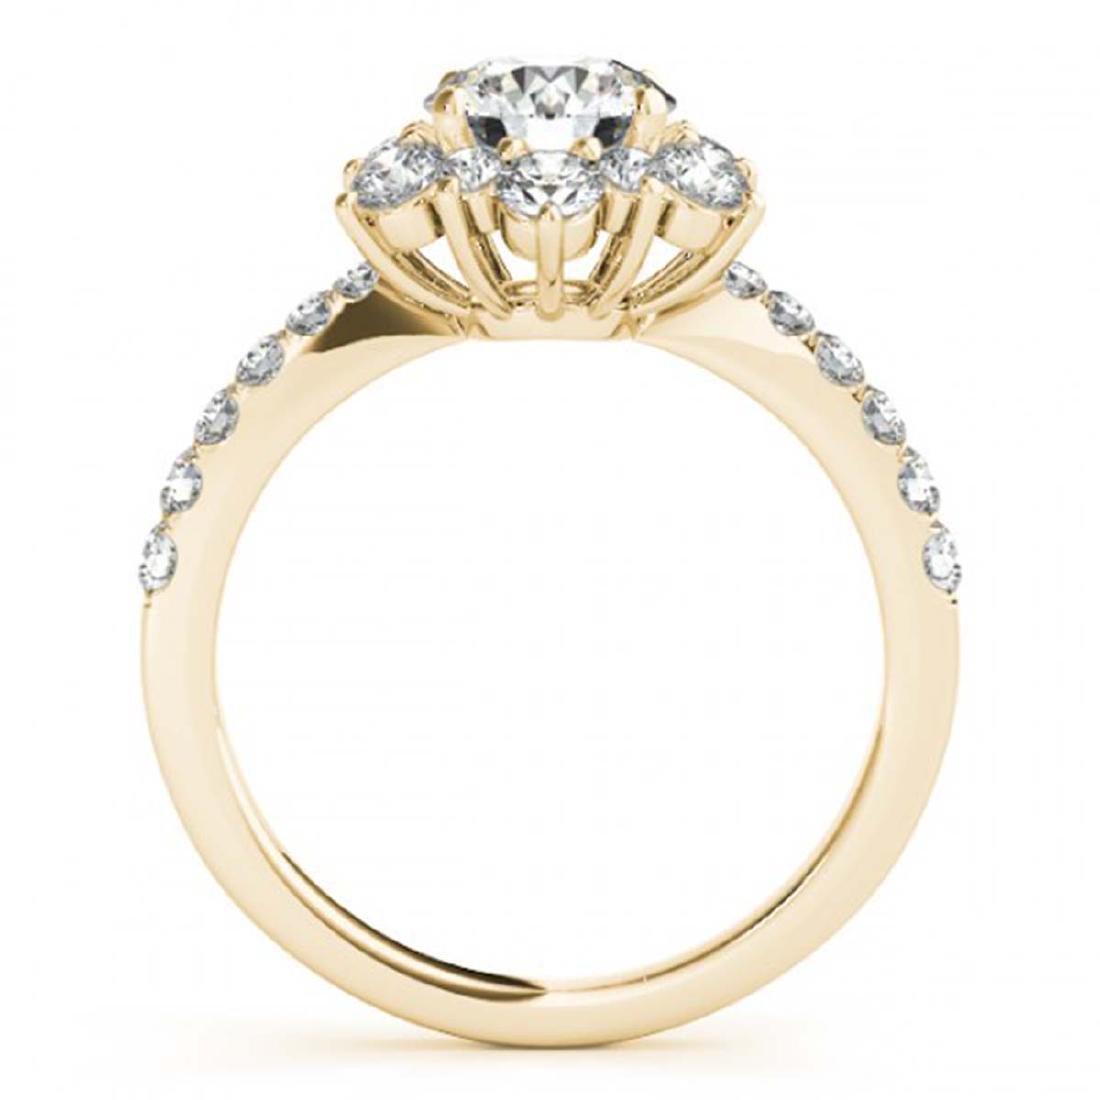 2.19 ctw VS/SI Diamond Halo Ring 18K Yellow Gold - - 2